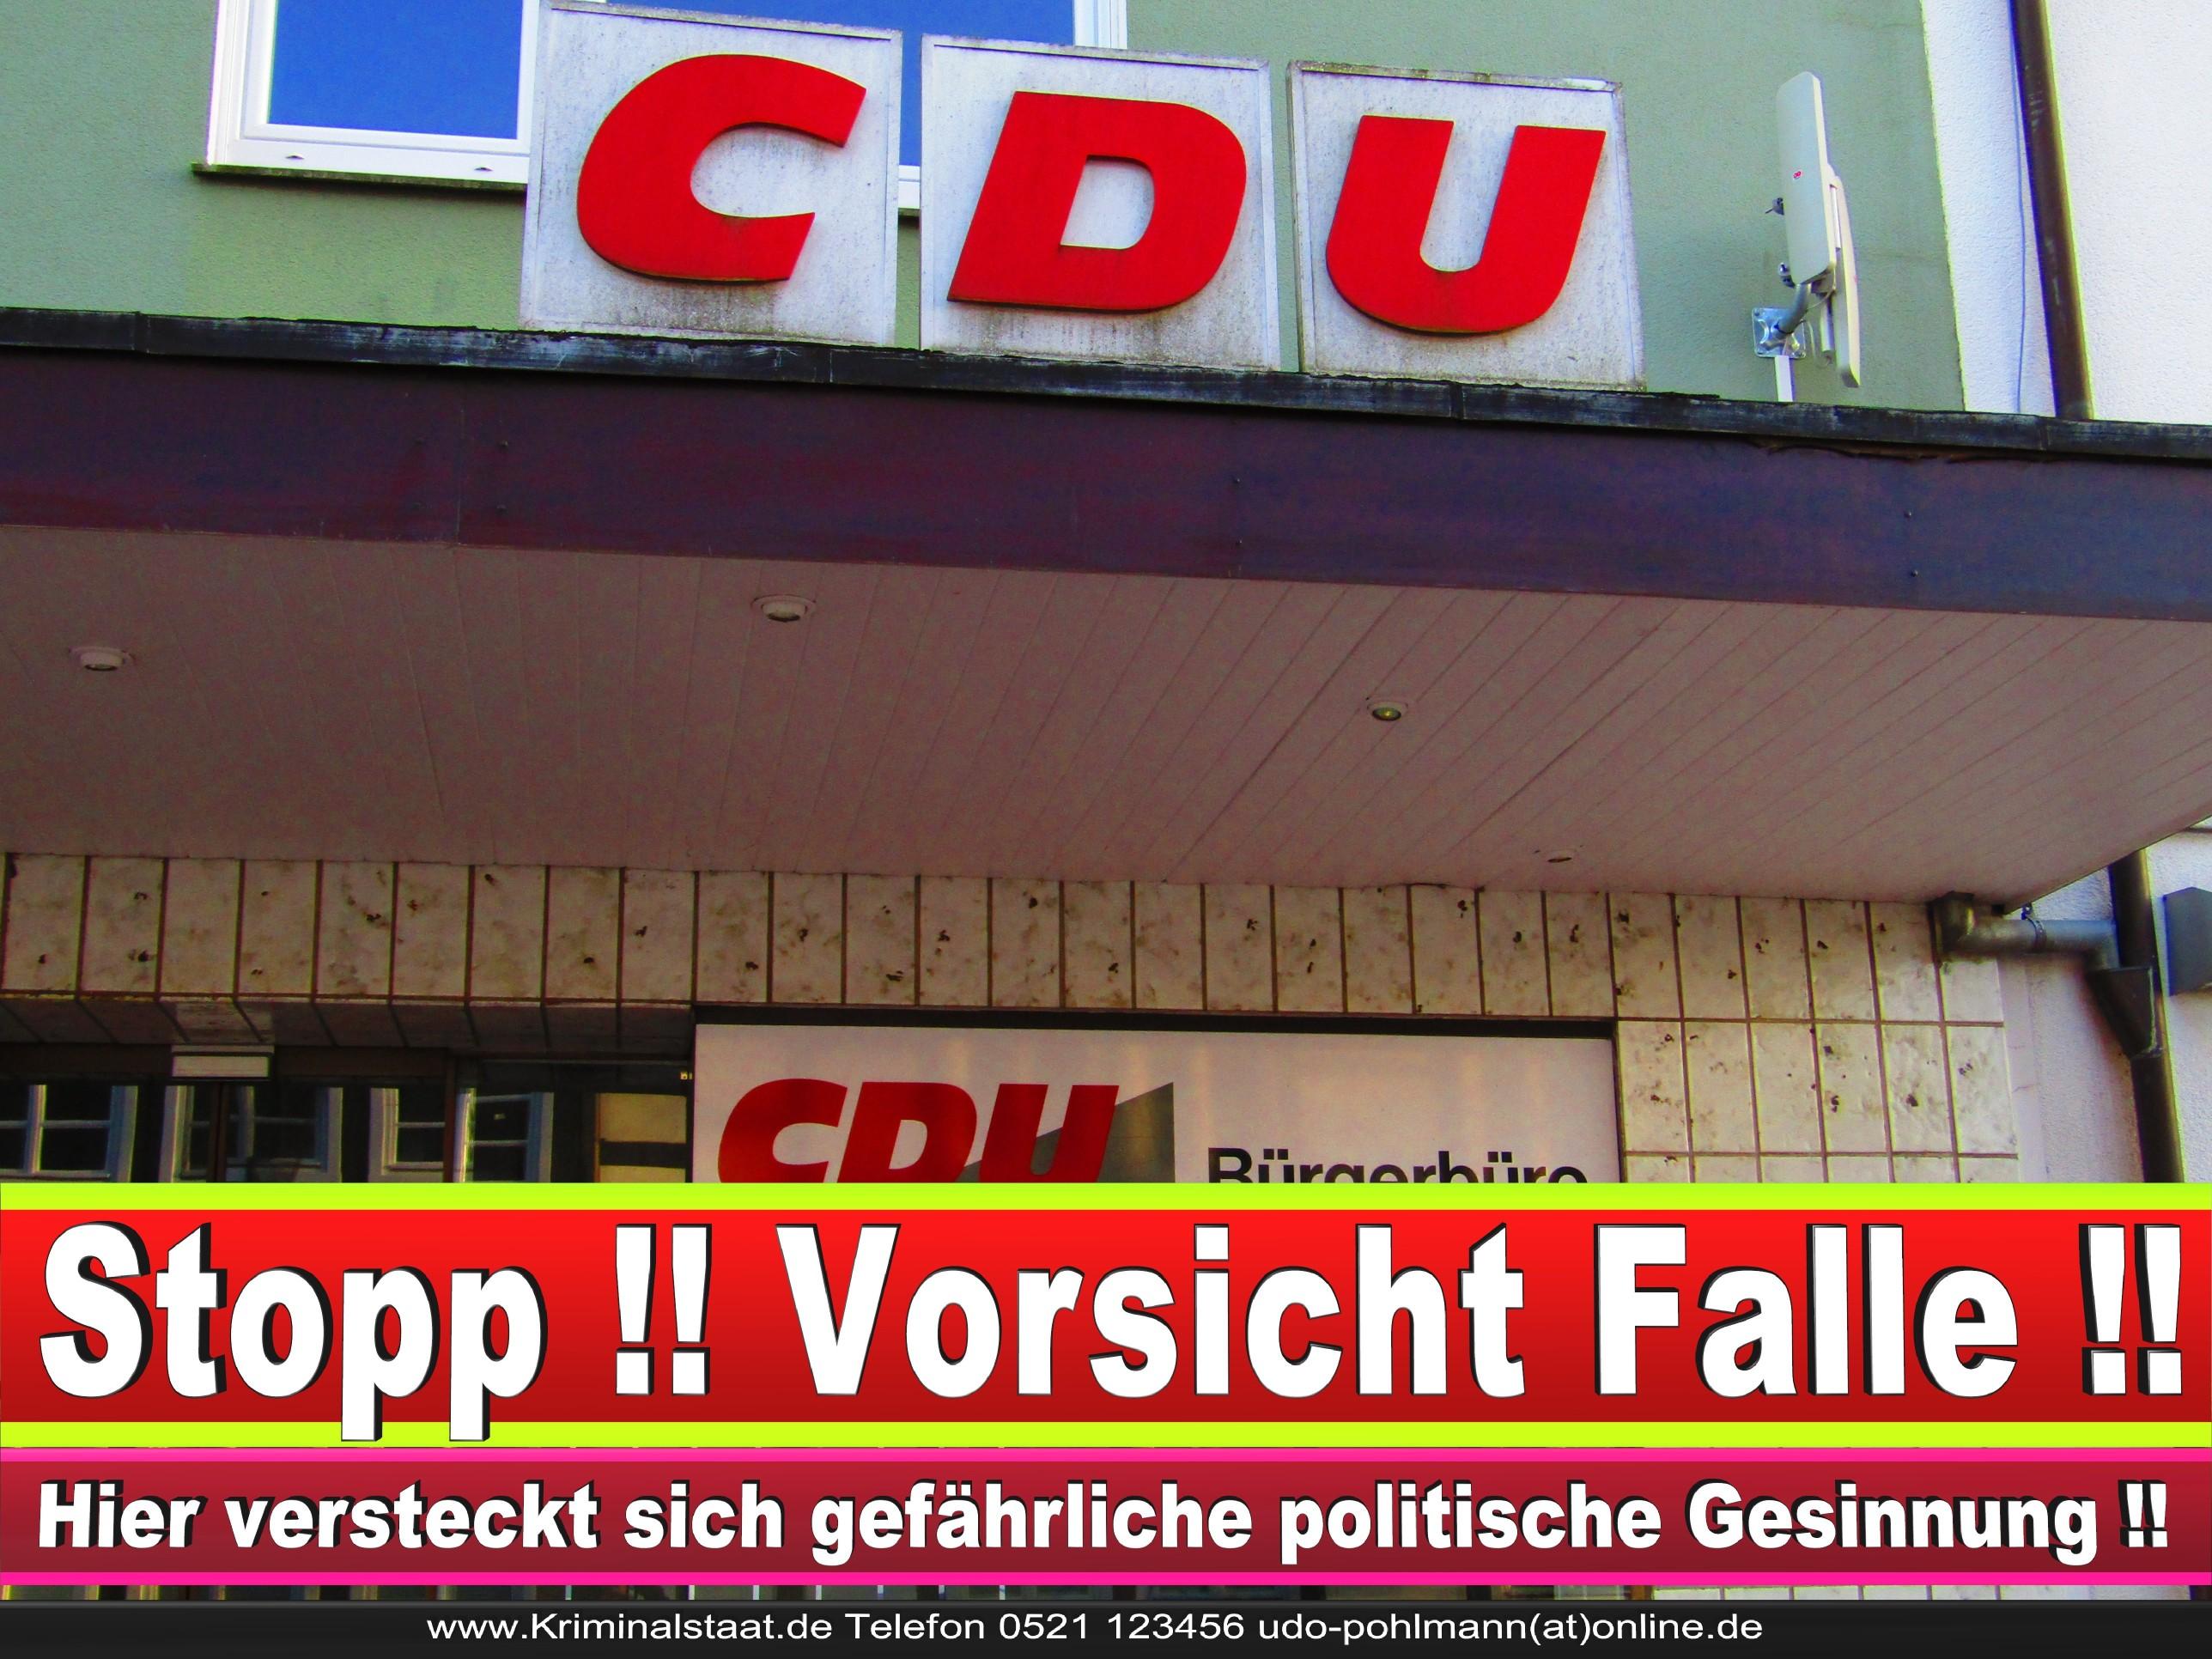 Rathaus Steinhagen CDU SPD FDP Ortsverband CDU Bürgerbüro CDU SPD Korruption Polizei Bürgermeister Karte Telefonbuch NRW OWL (3)